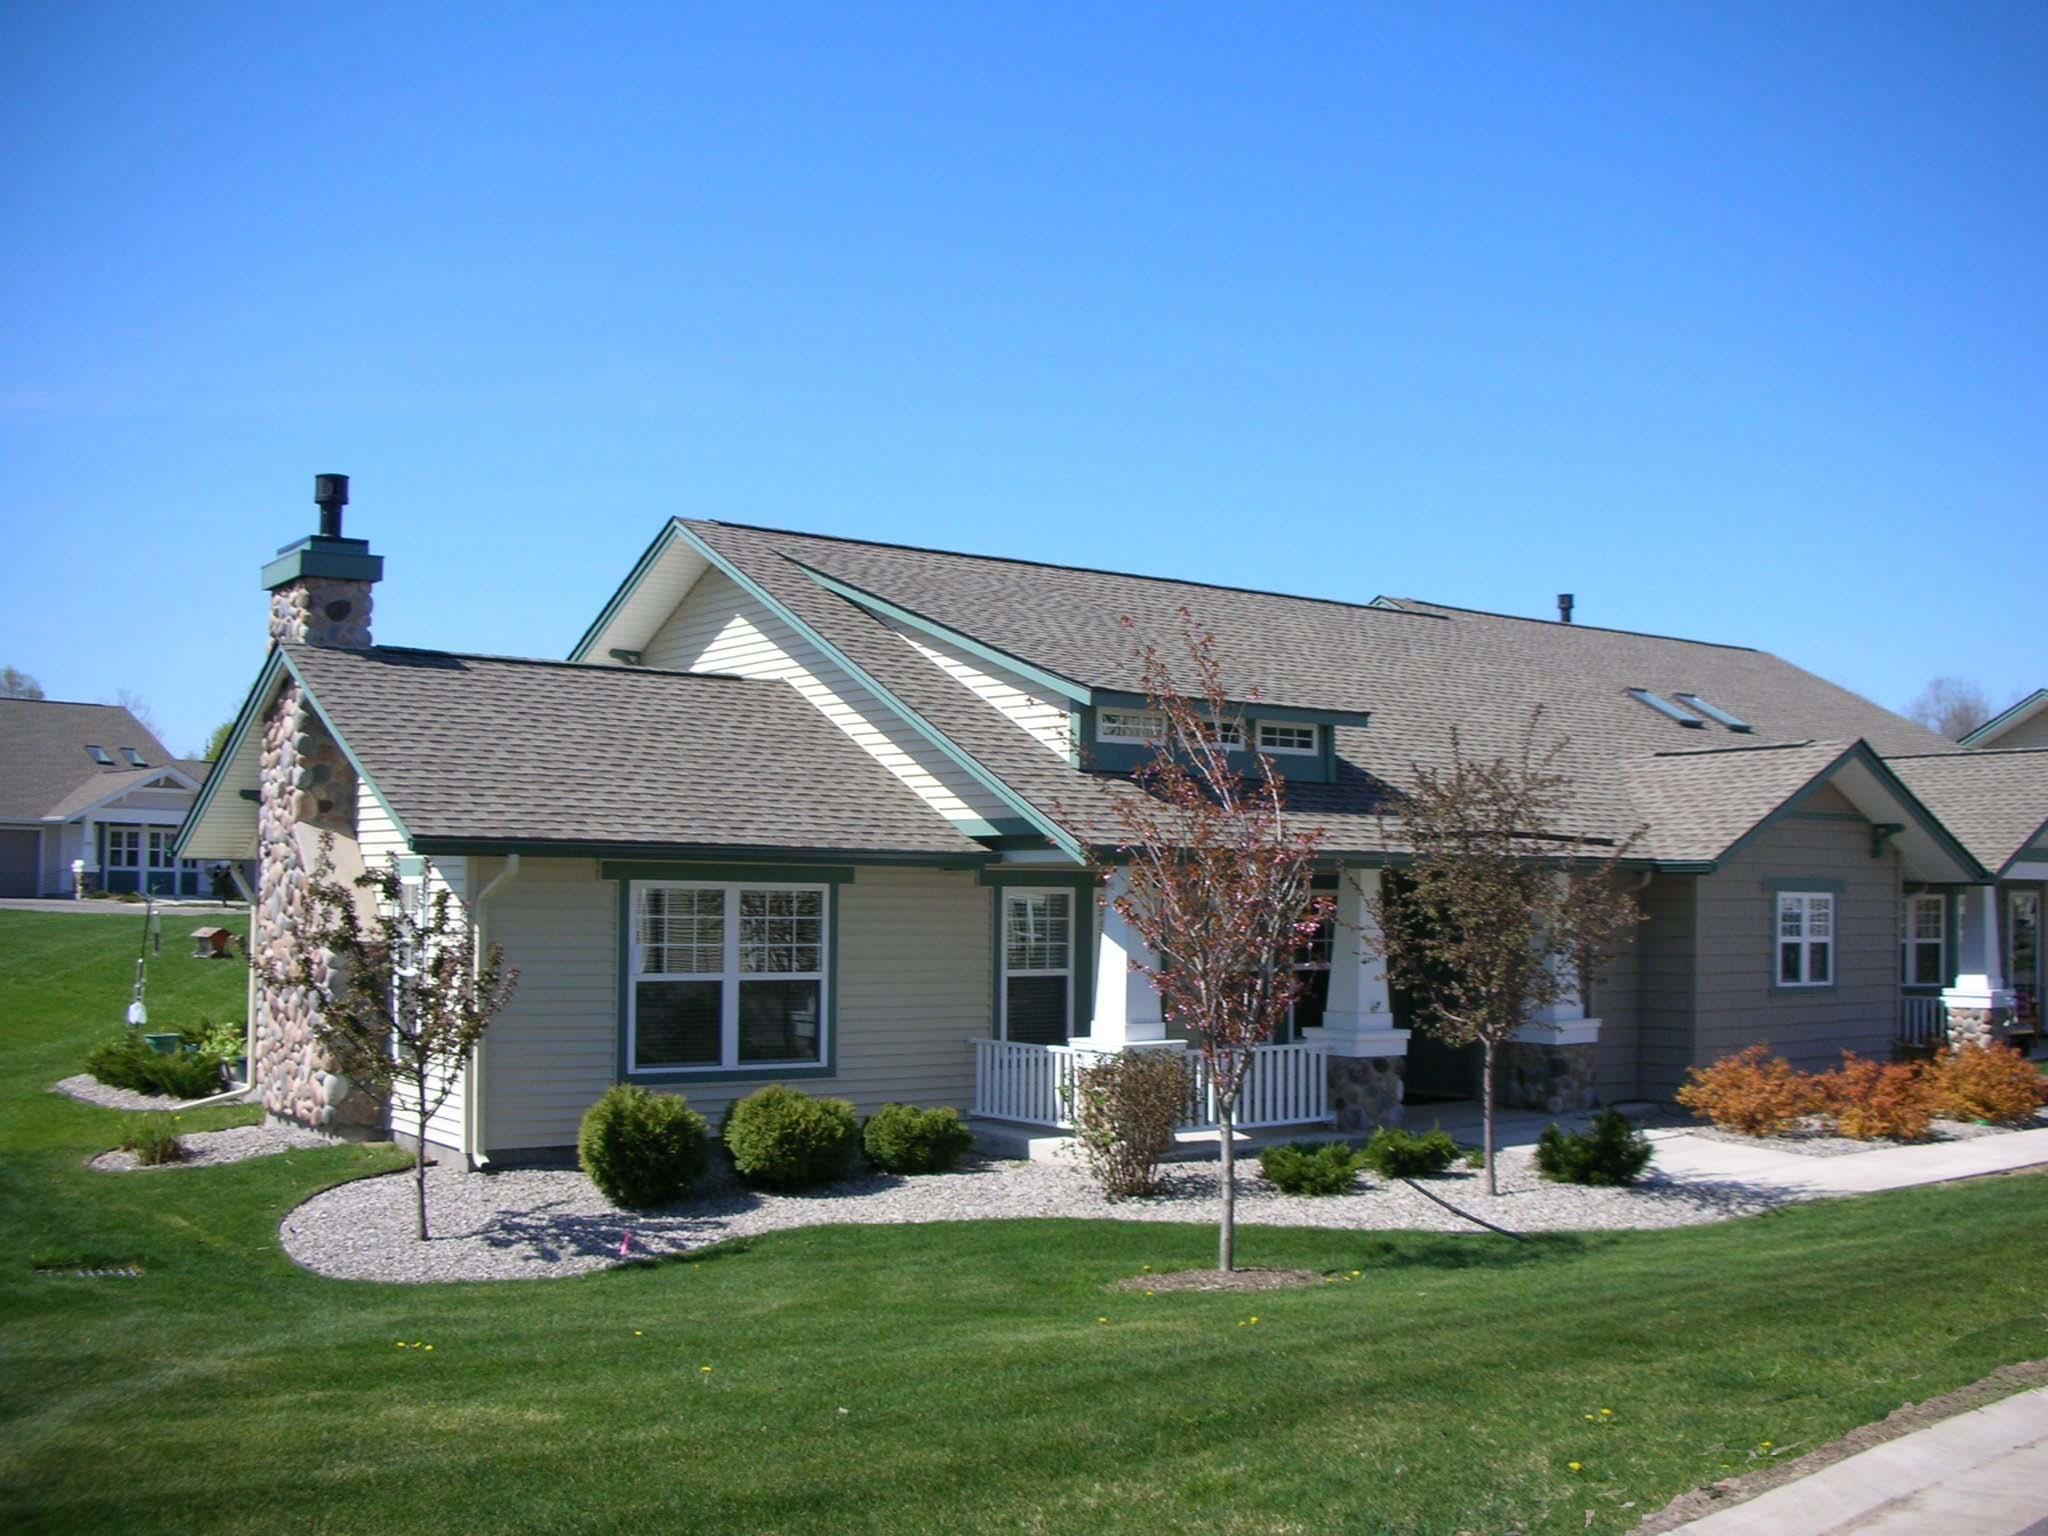 St. Ann's Community at Cherry Ridge image 1